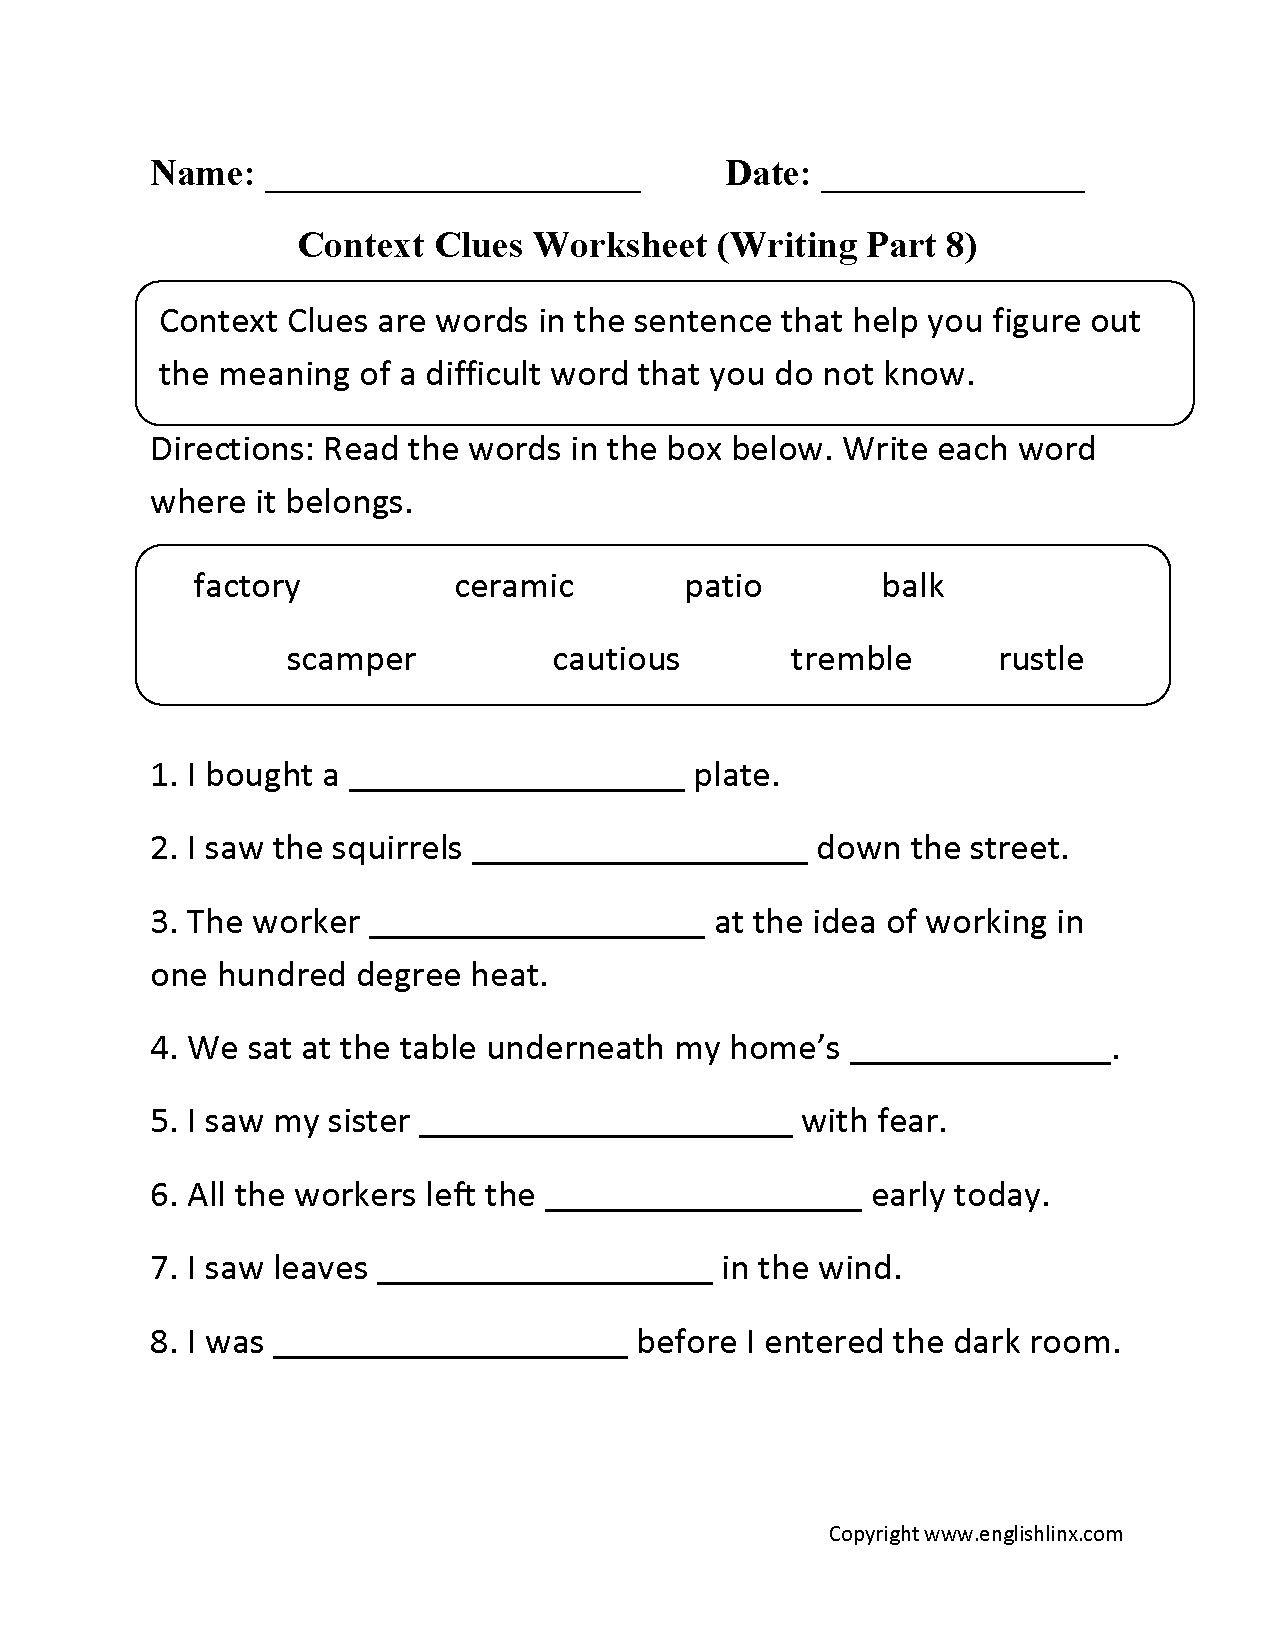 Context Clues Worksheet Writing Part 8 Intermediate